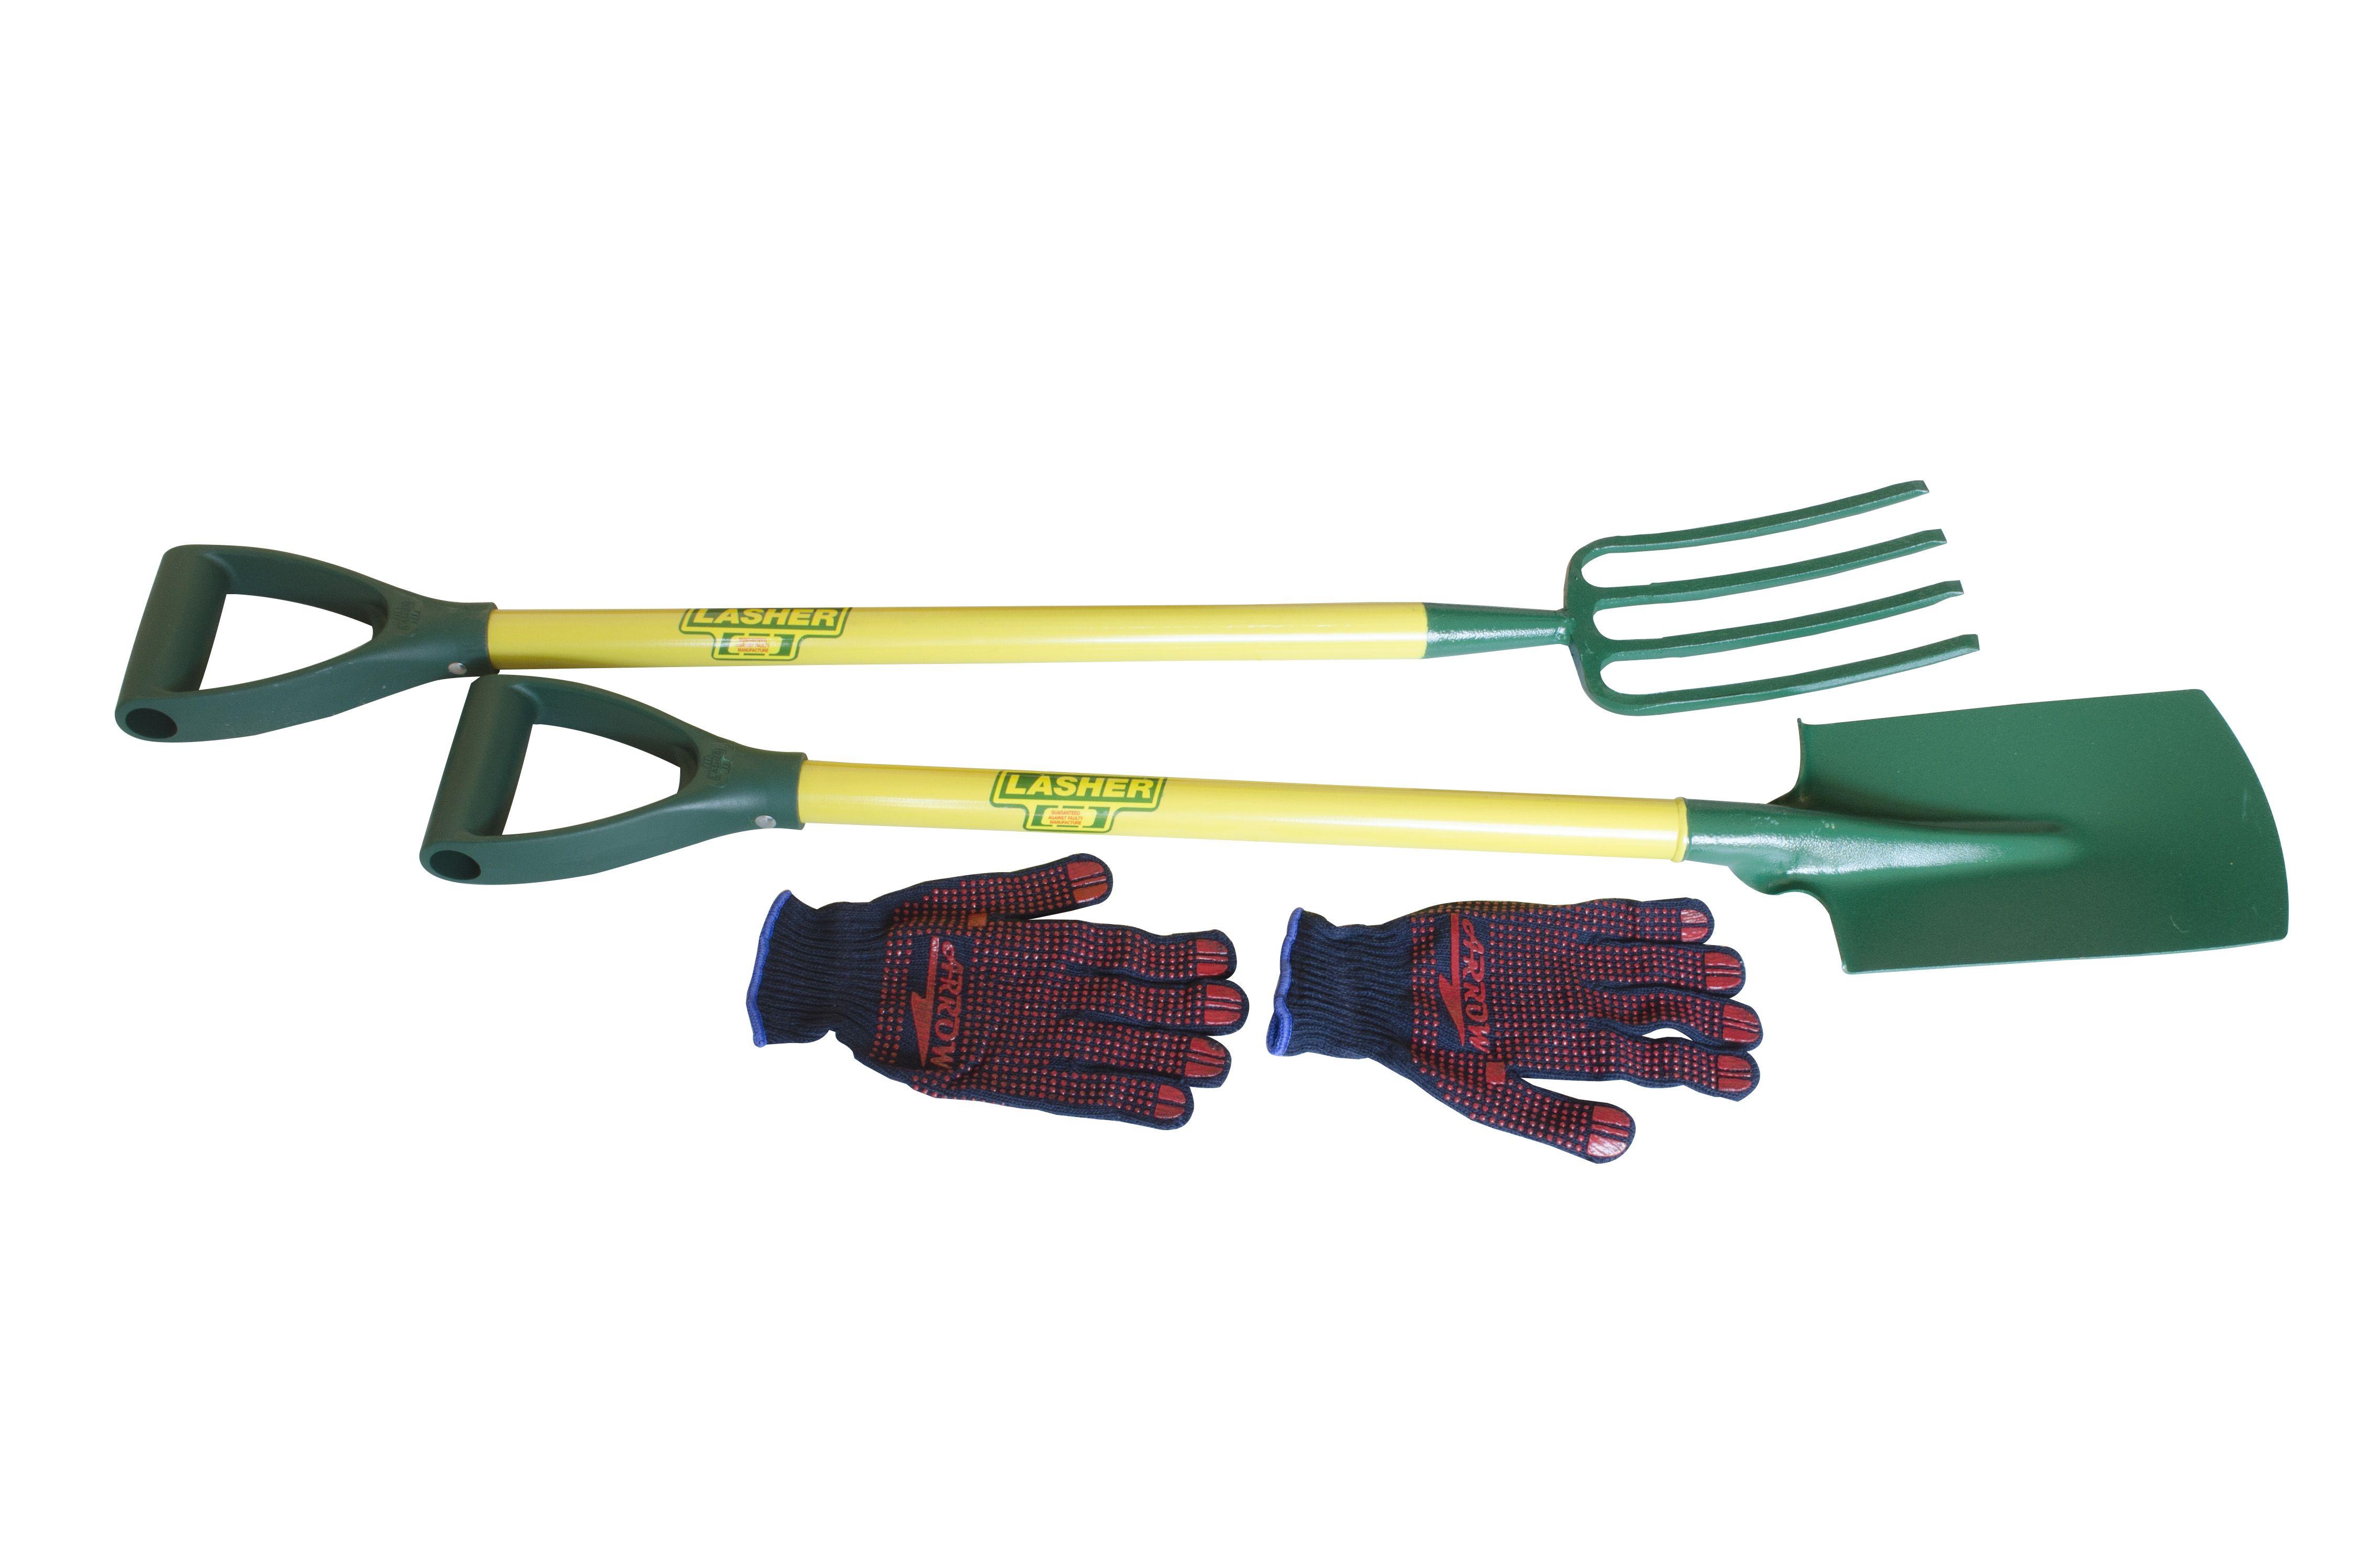 Lasher Tools Gardening Starter Kit Garden Tools Garden Tools